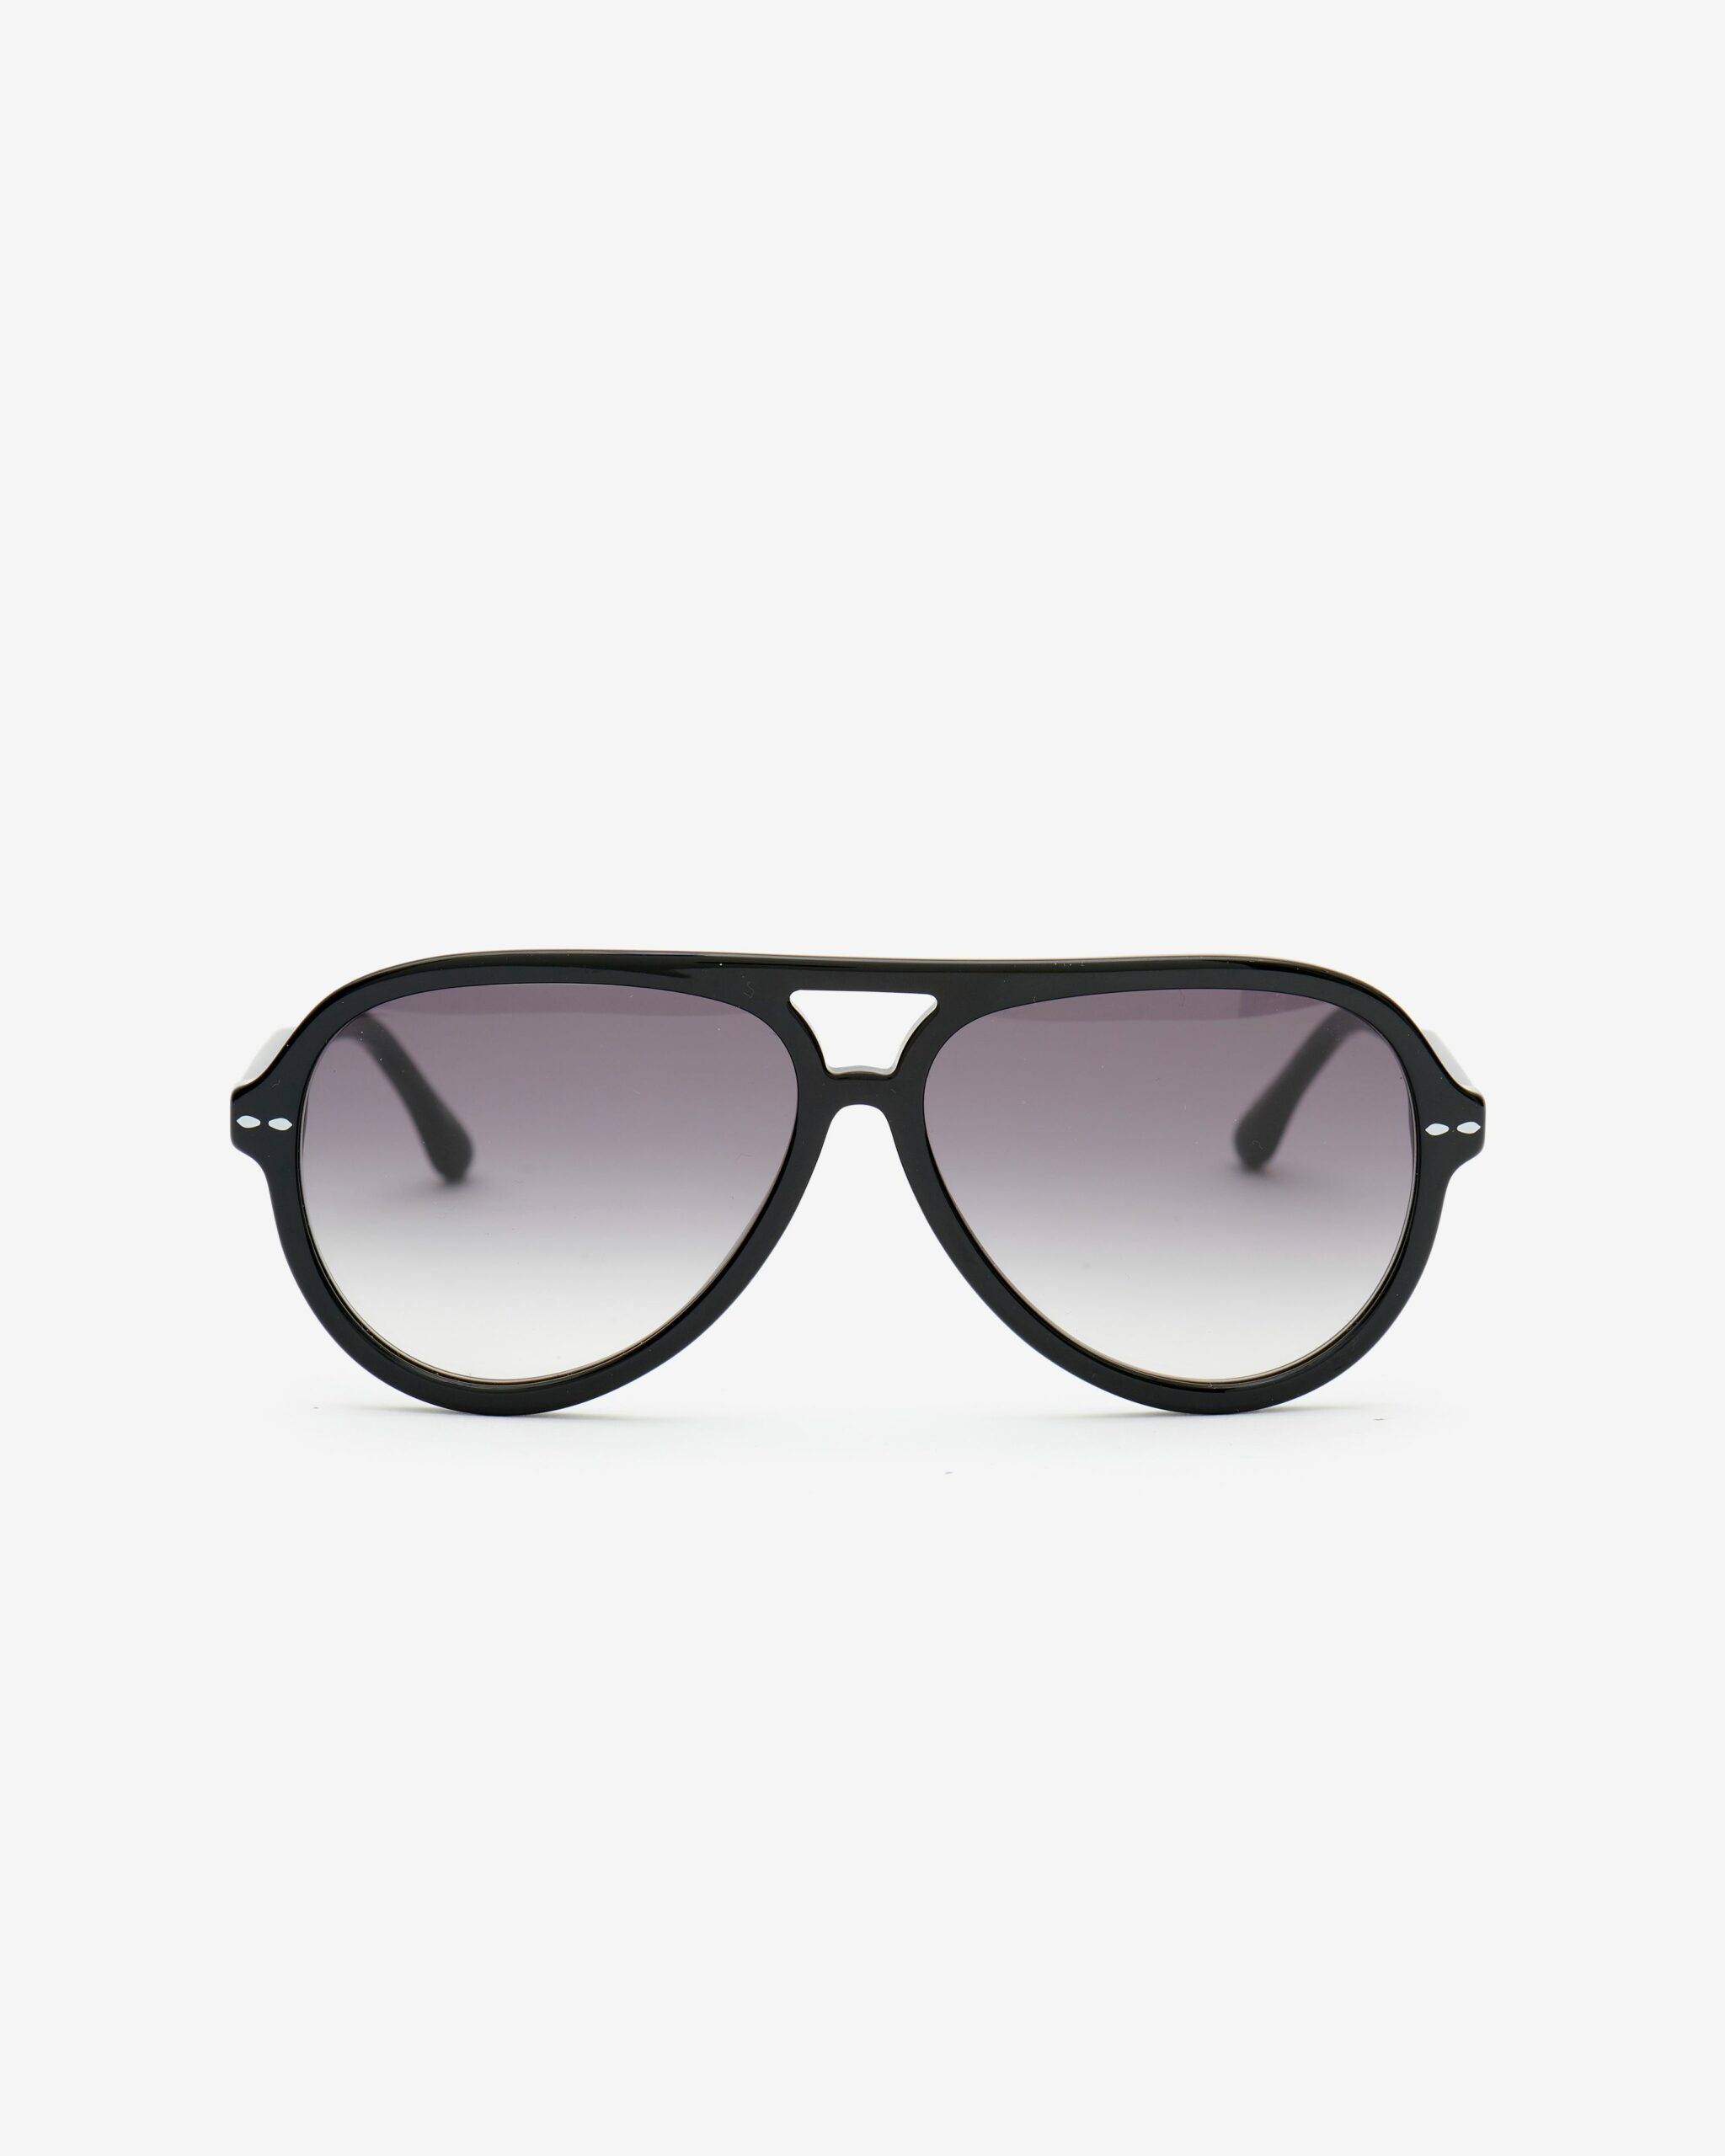 Sunglasses, Isabel Marant, Eviator